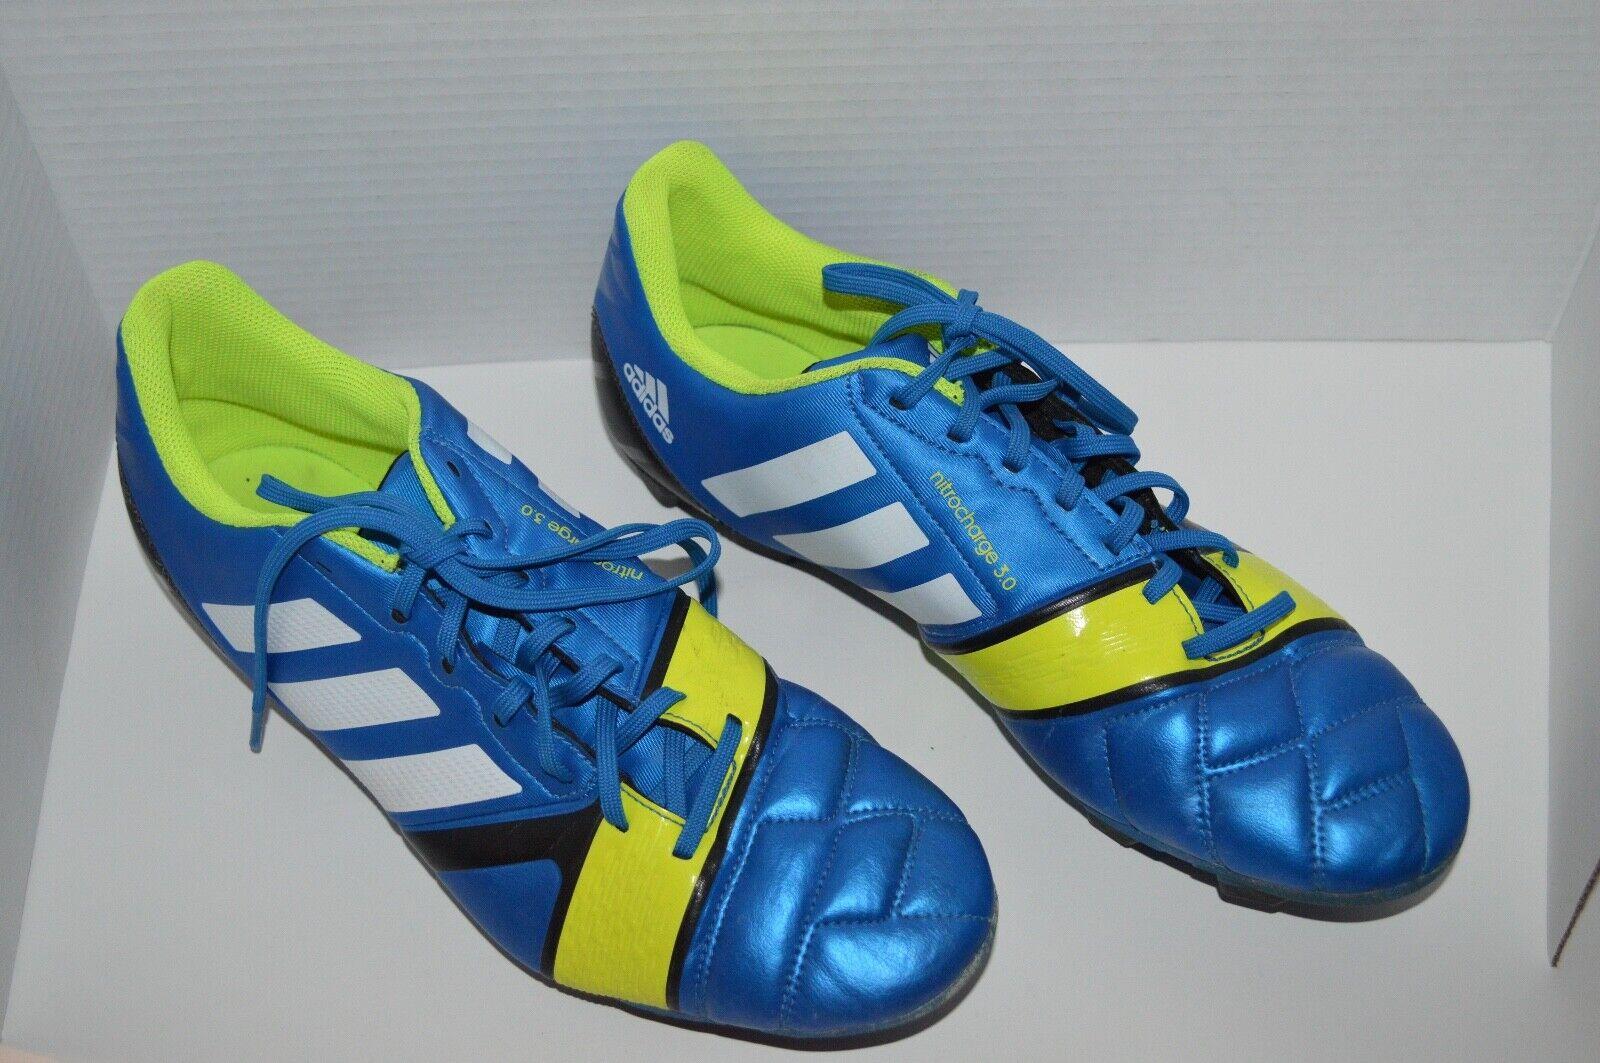 4548f9222 Adidas Nitrocharge 3.0 Mens Size 12 Cleats bluee nveosp291-Men ...